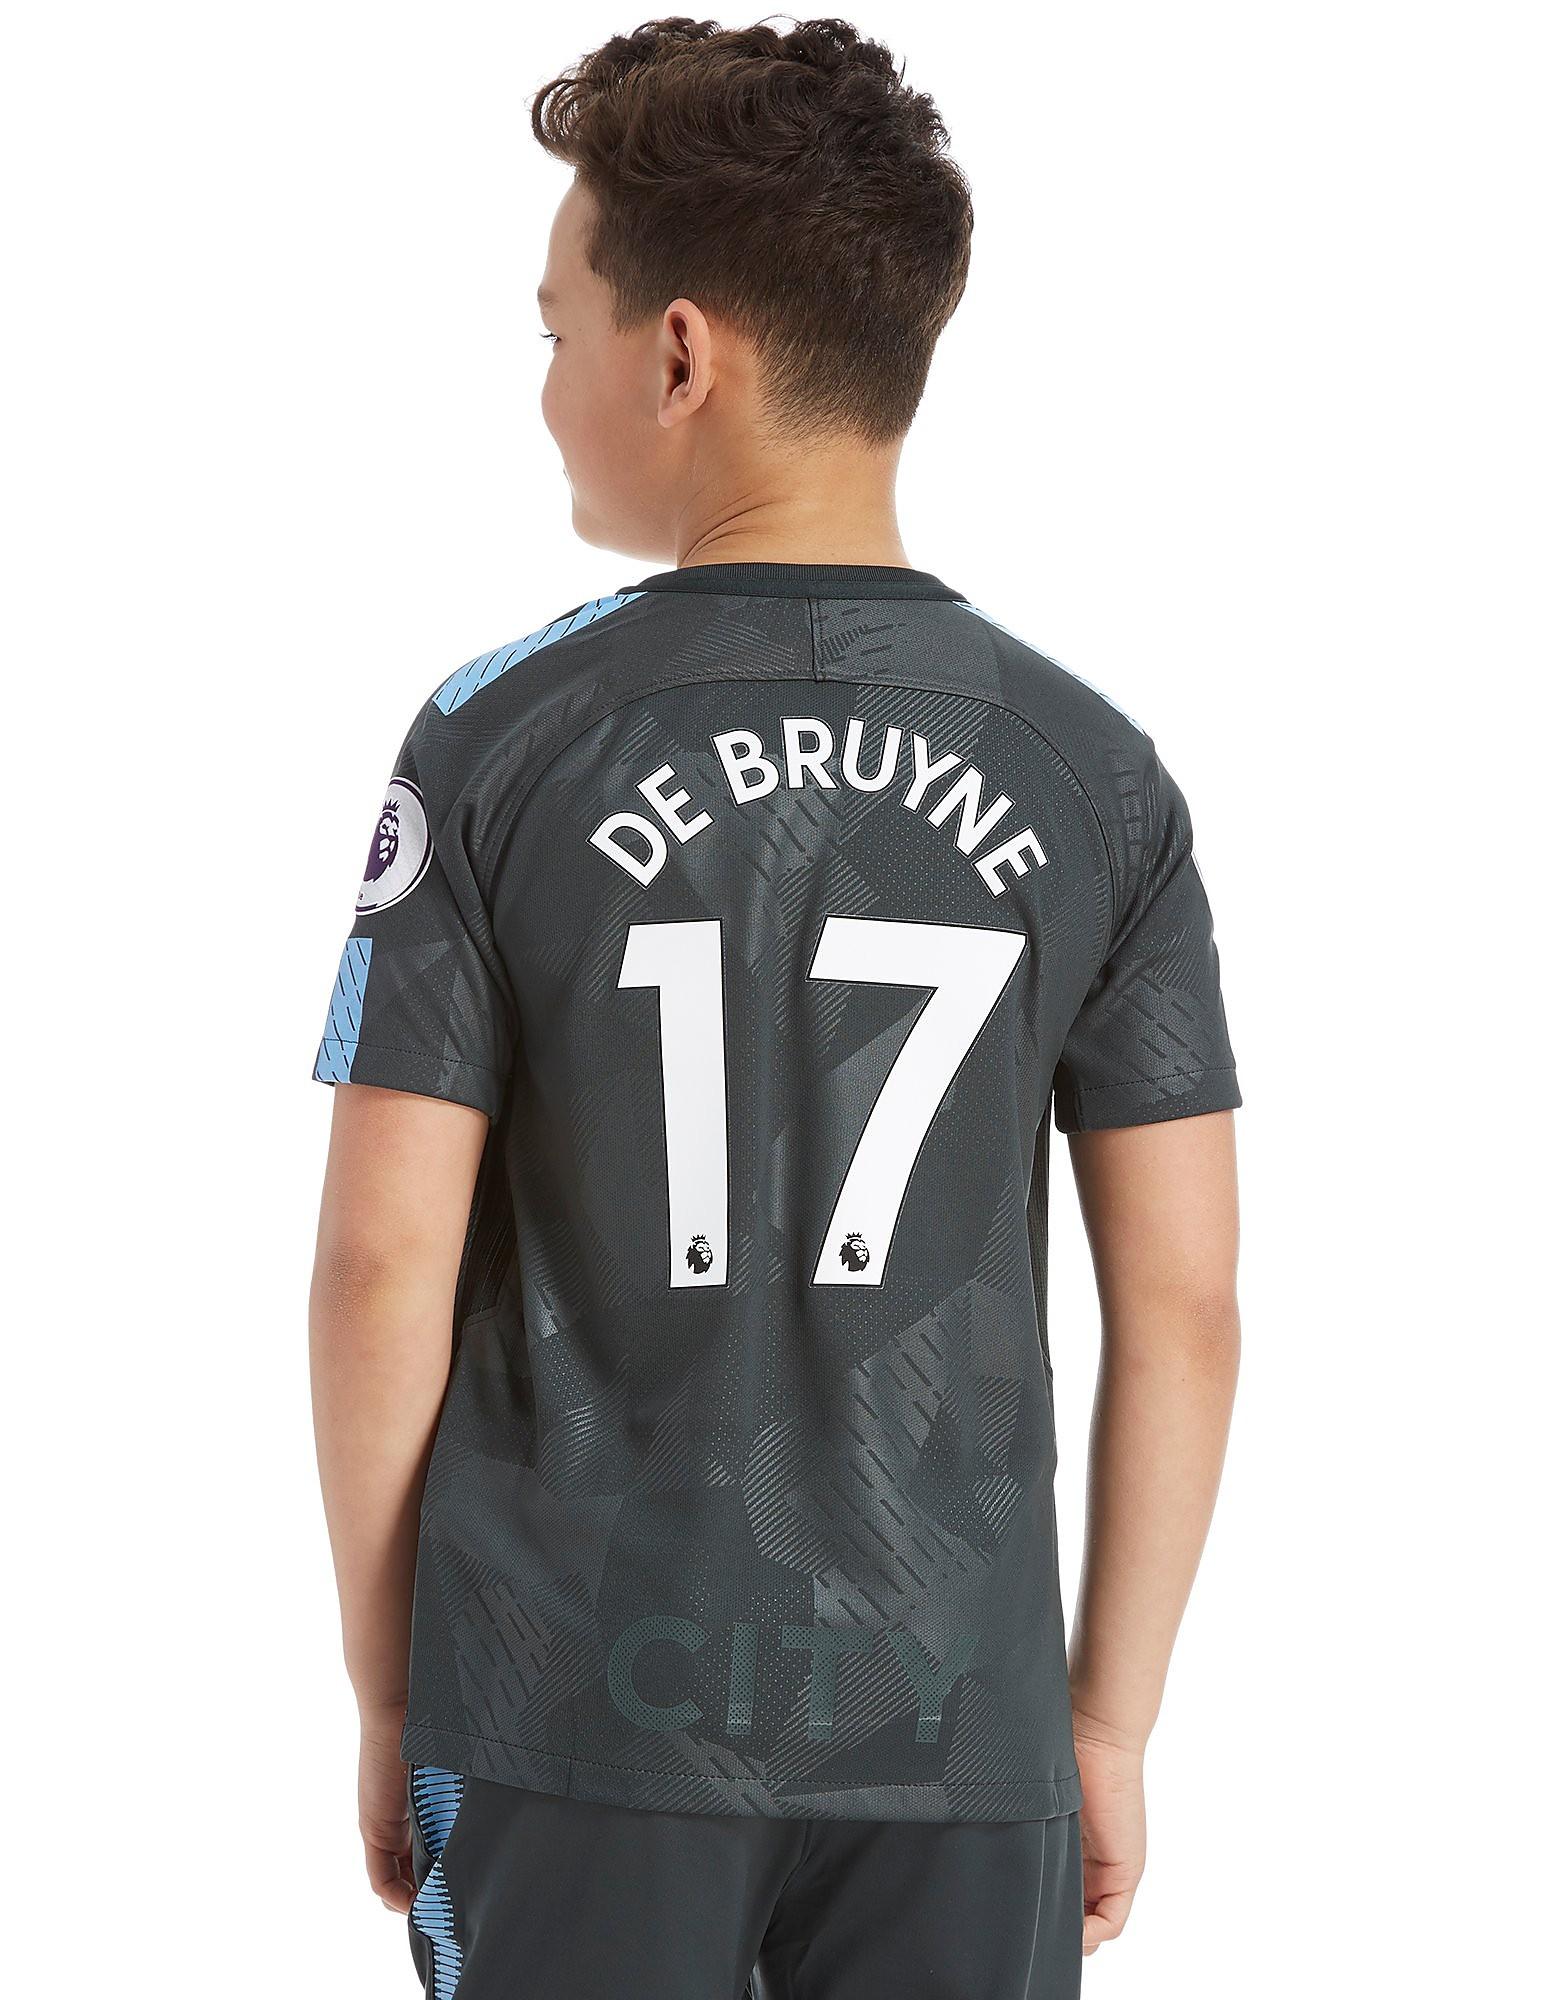 Nike Manchester City 2017 De Bruyne #17 Third Shirt Jnr